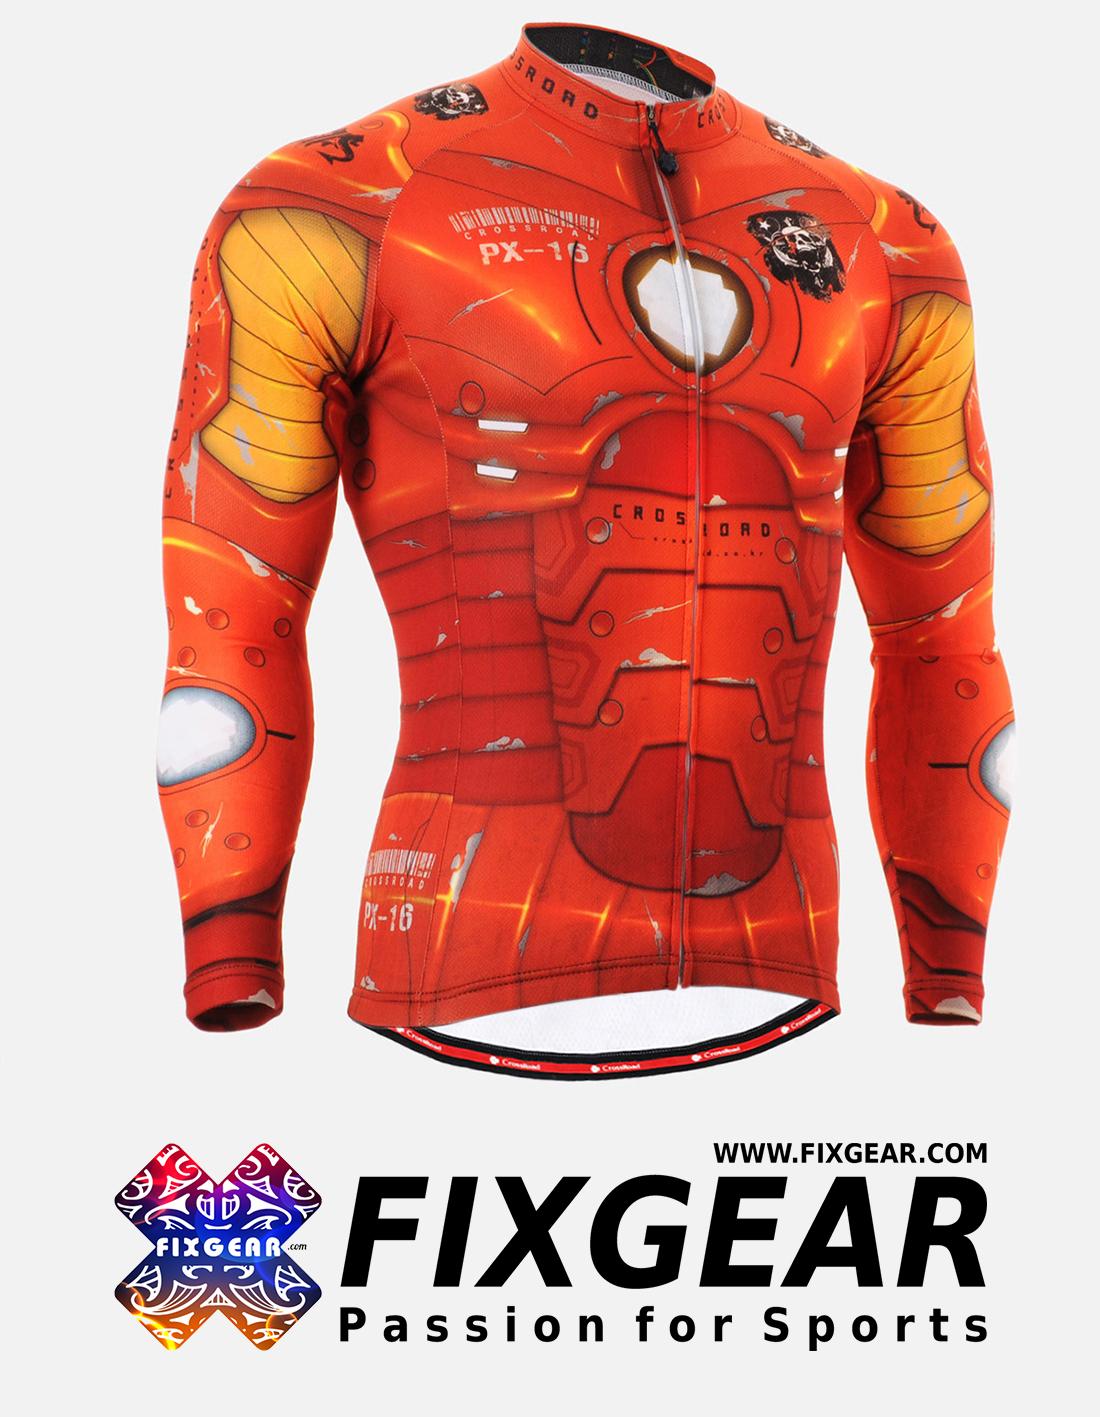 FIXGEAR CS-801 Men's Cycling  Jersey Long Sleeve